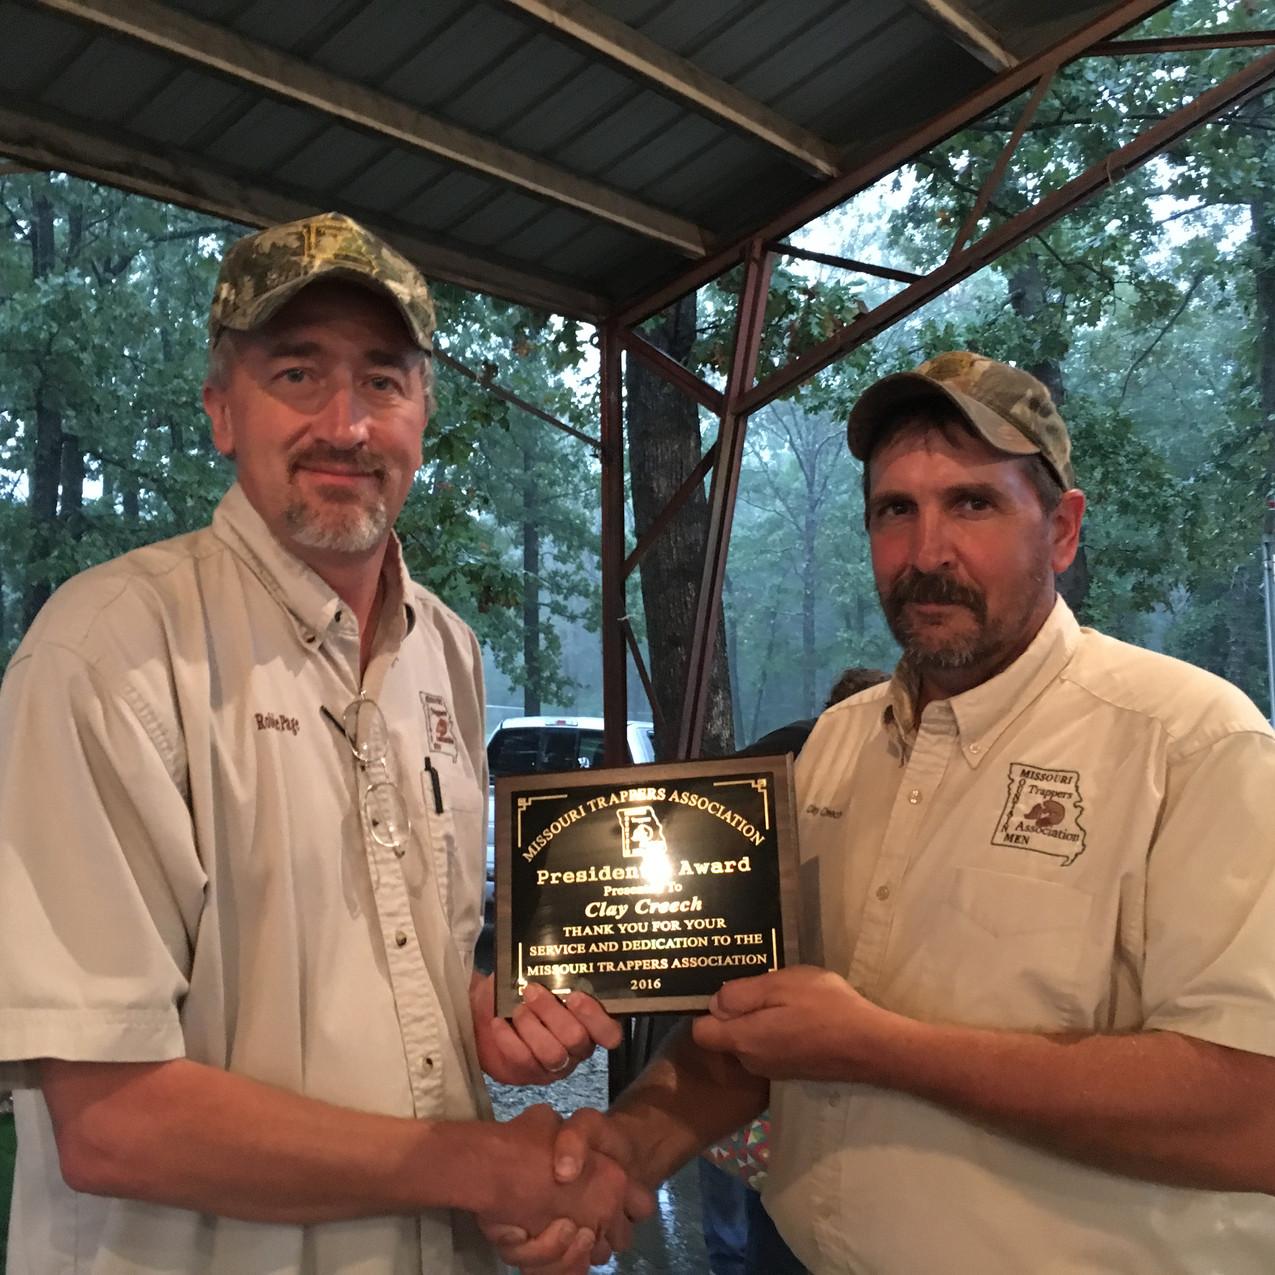 Clay Creech, President's Award